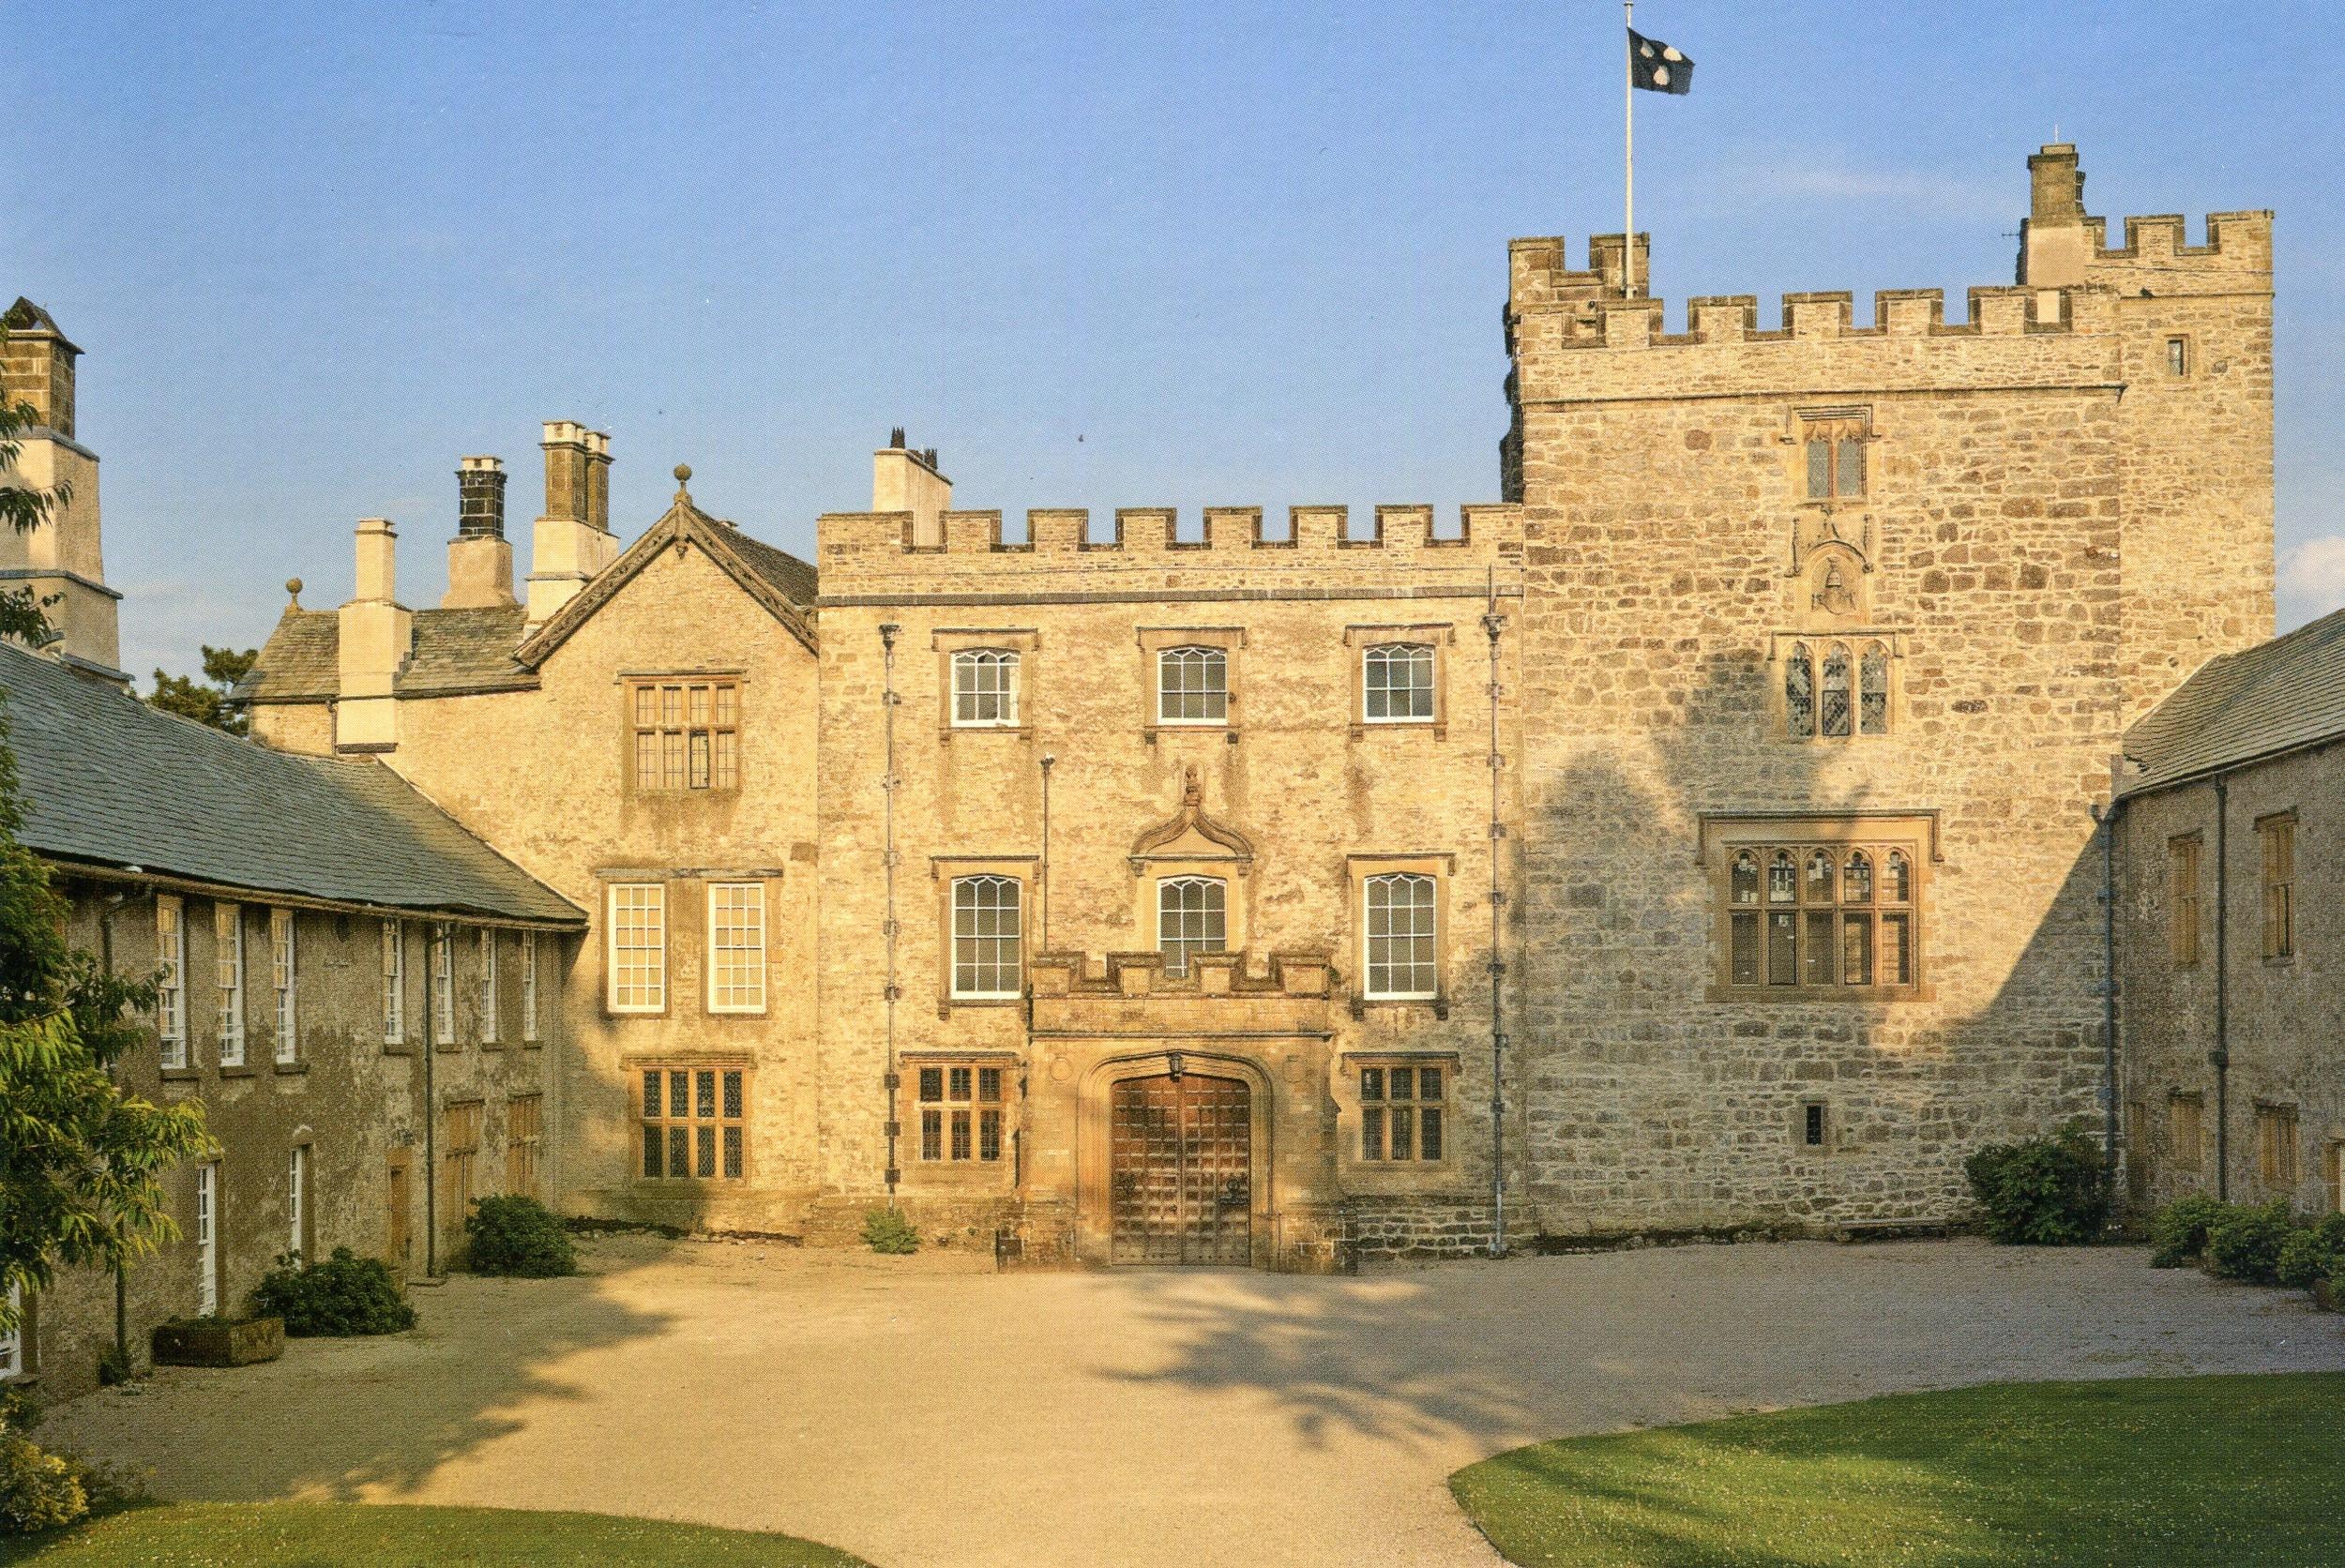 Sizergh Castle, England